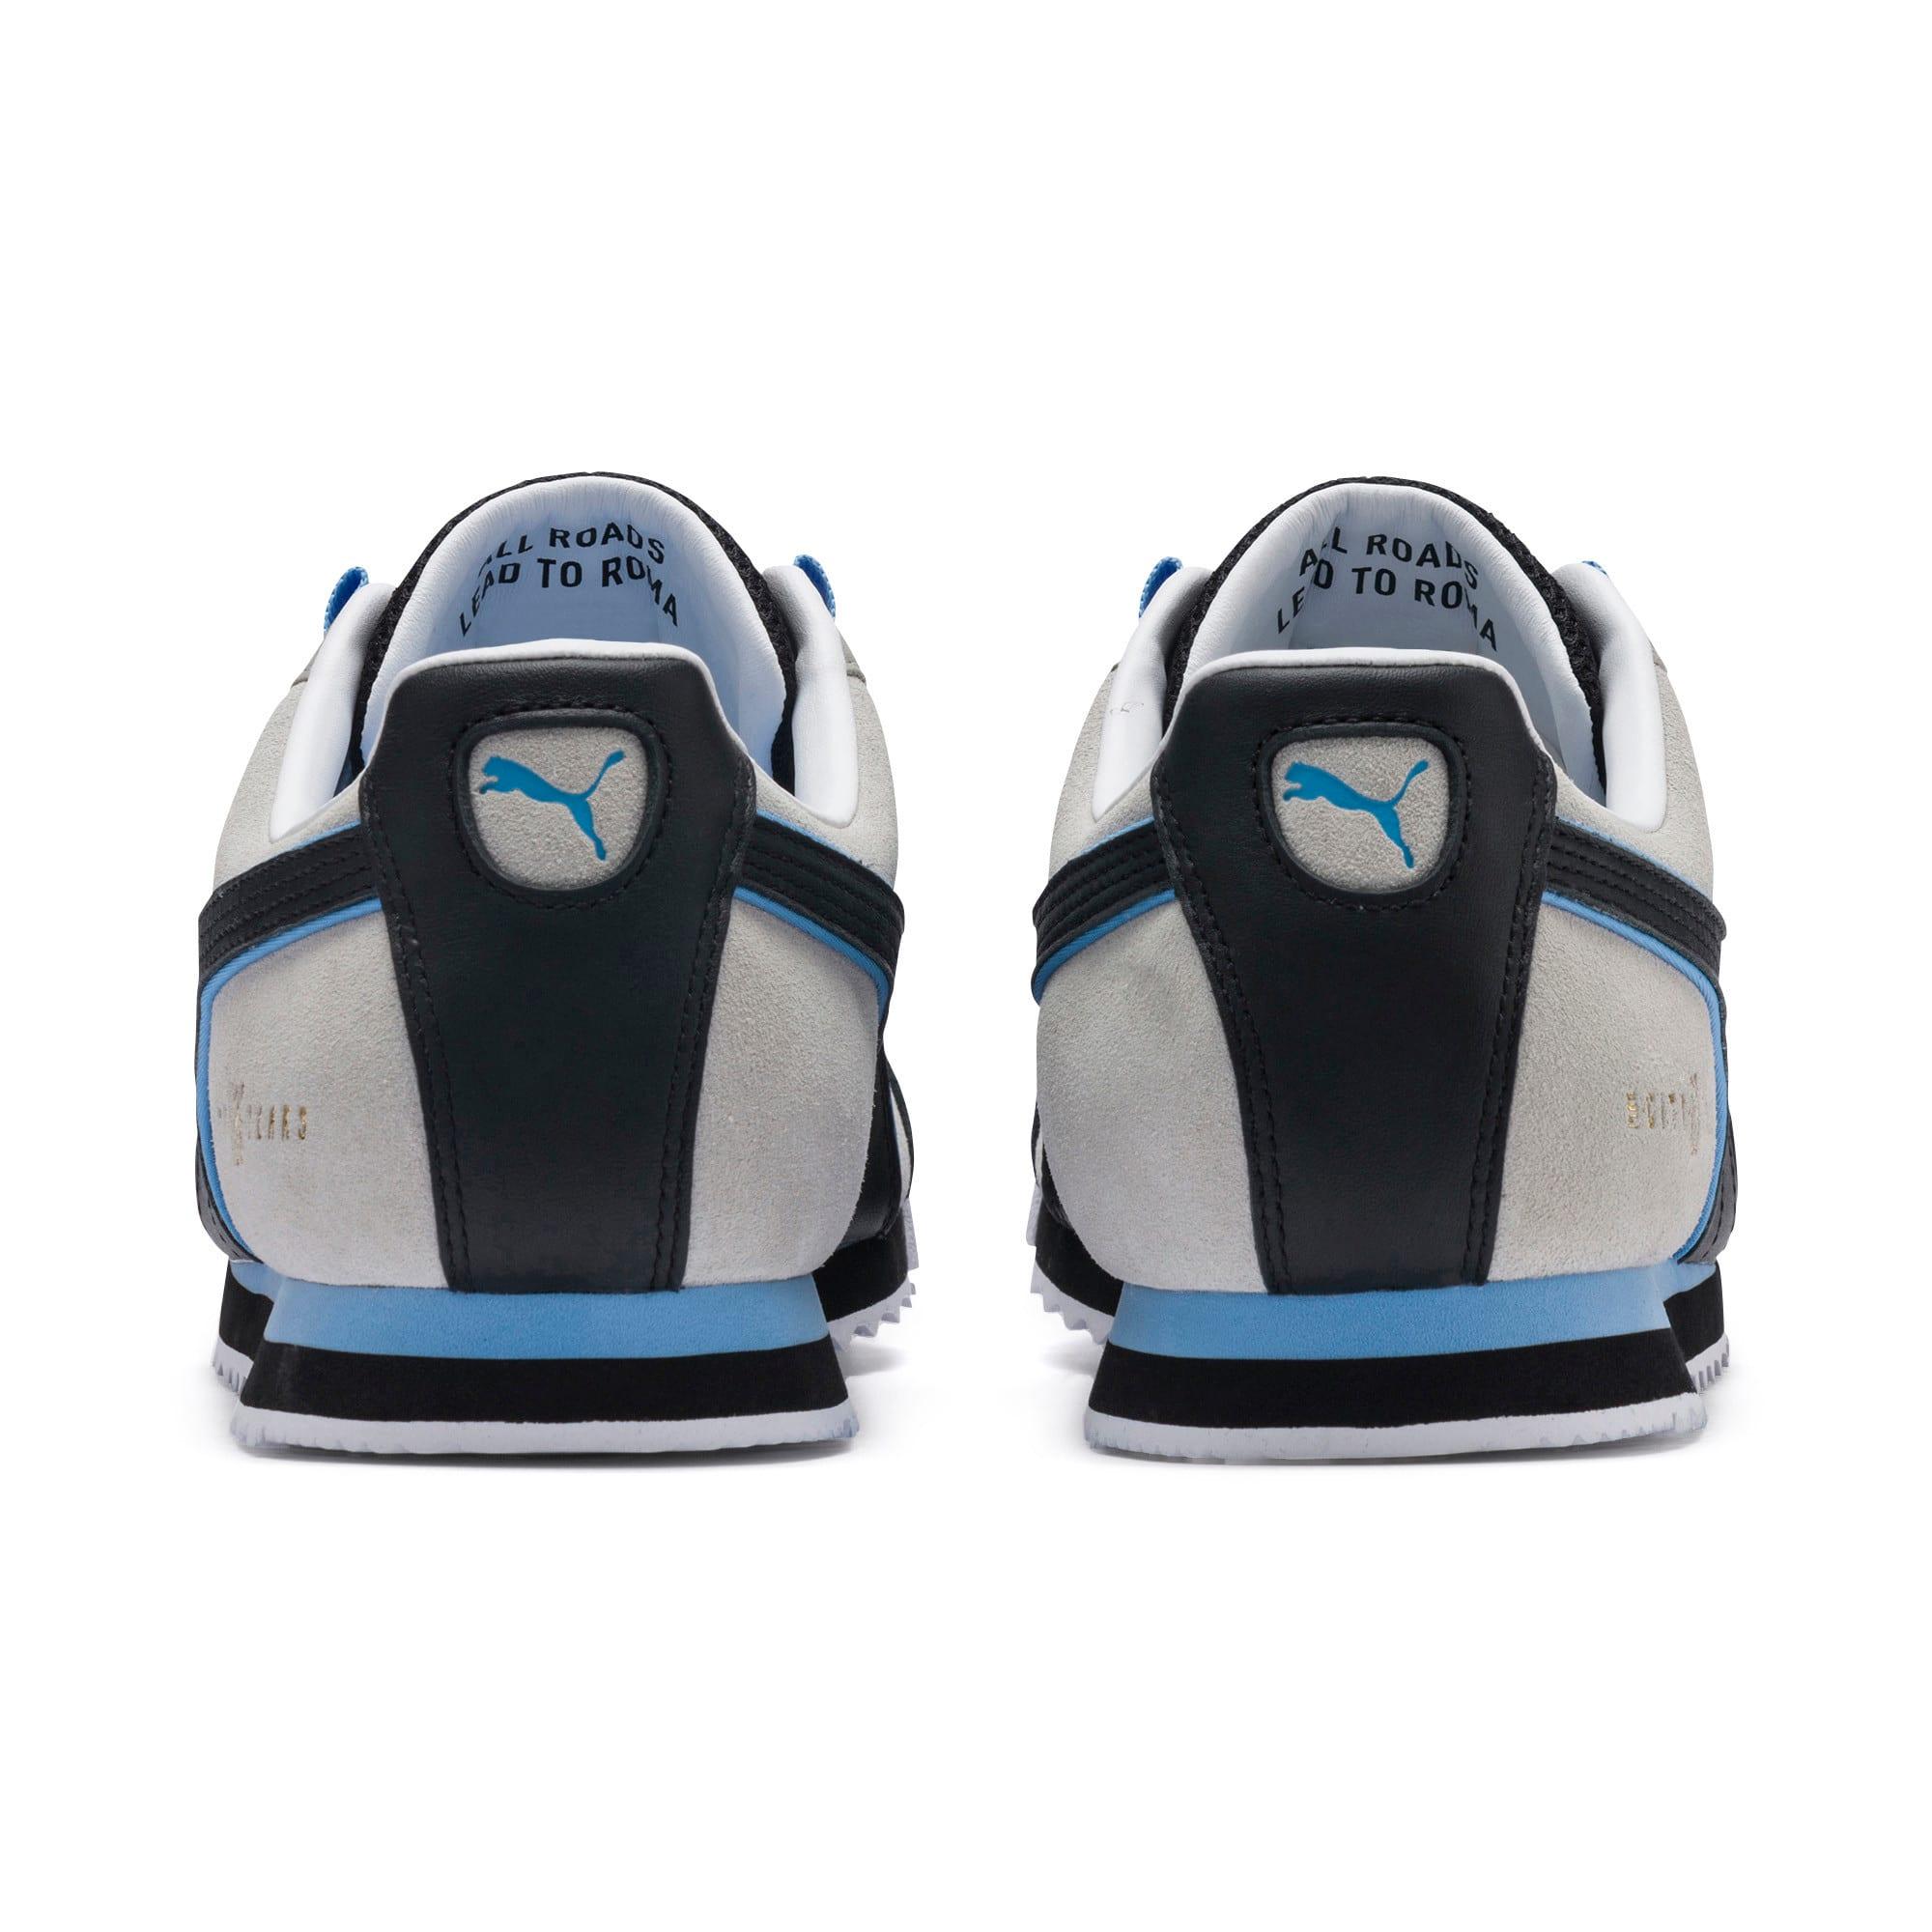 Thumbnail 3 of Roma Manchester City Men's Sneakers, Gray Violet-Team Light Blue, medium